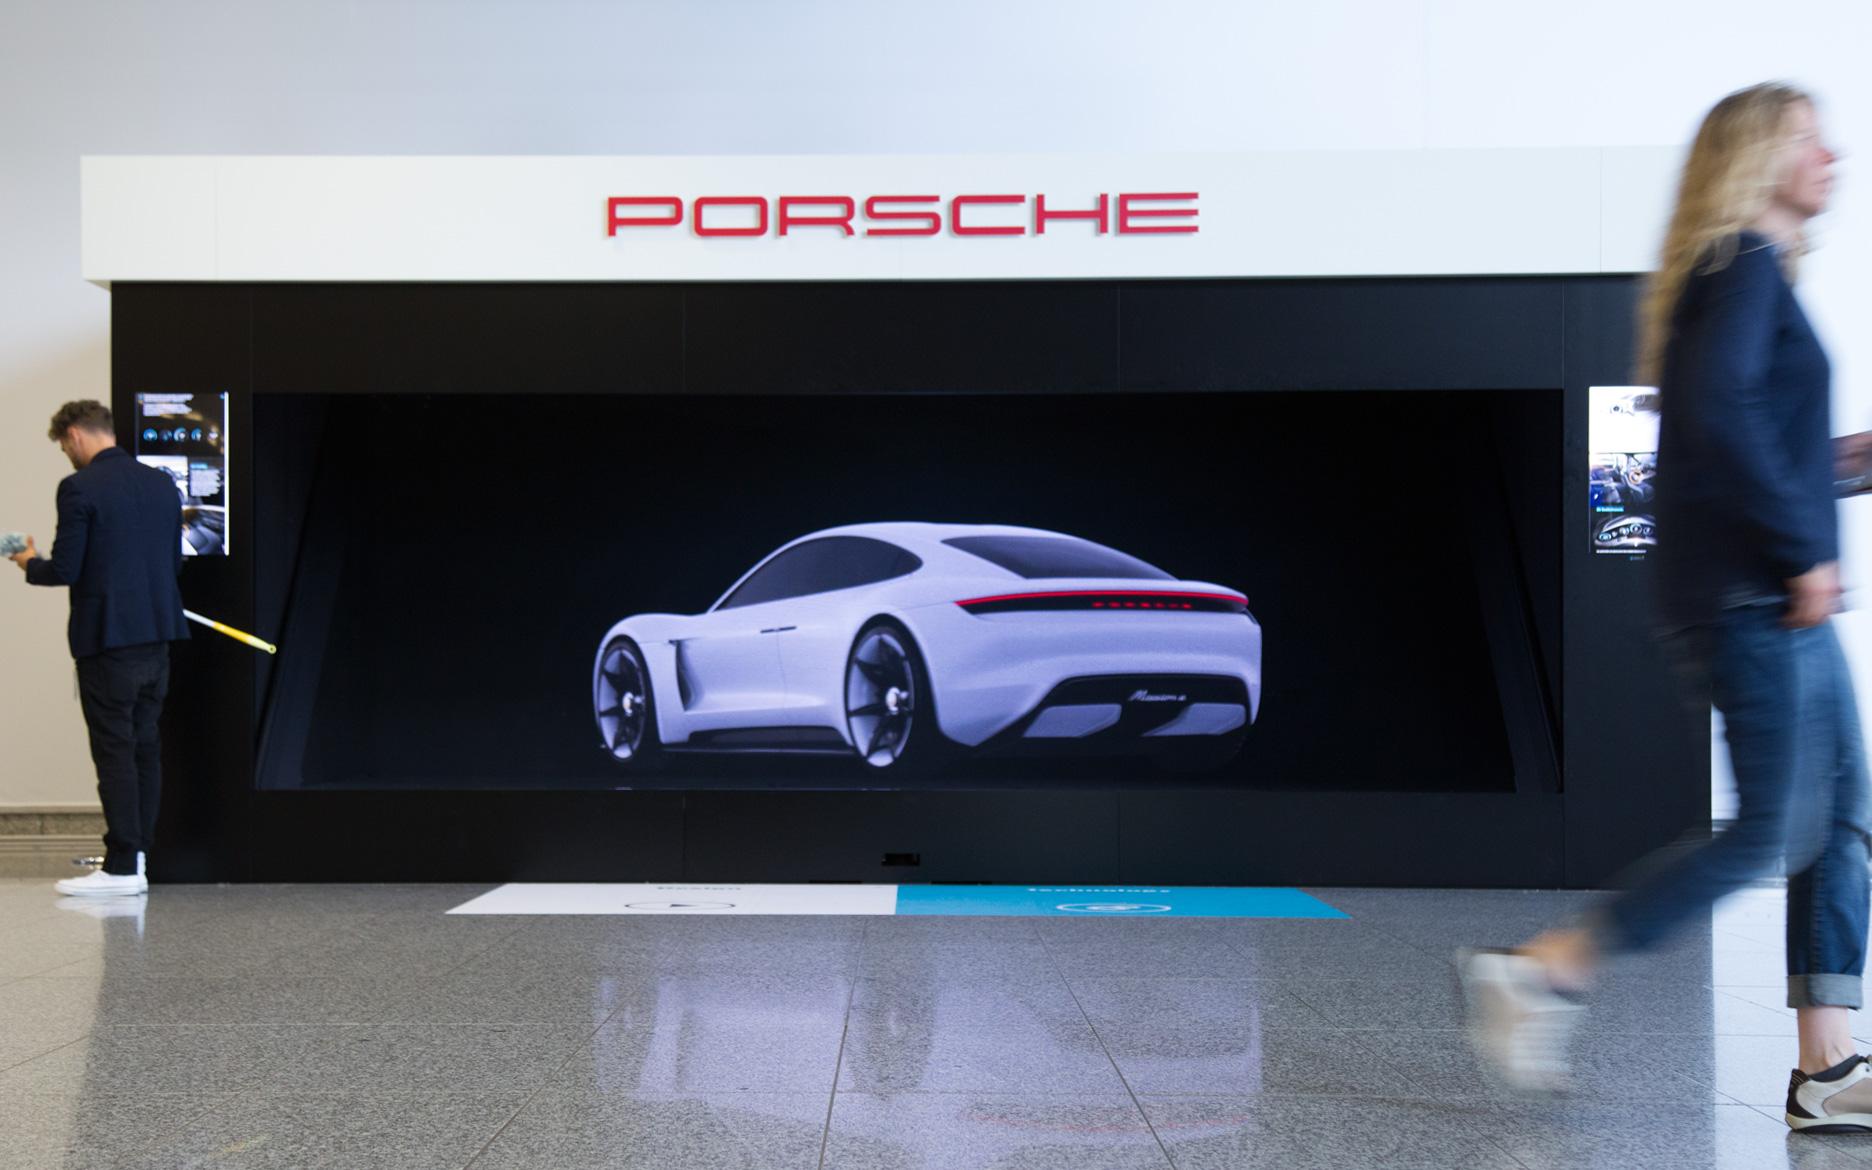 tennagels Holografie, Porsche, Holografische Projektion